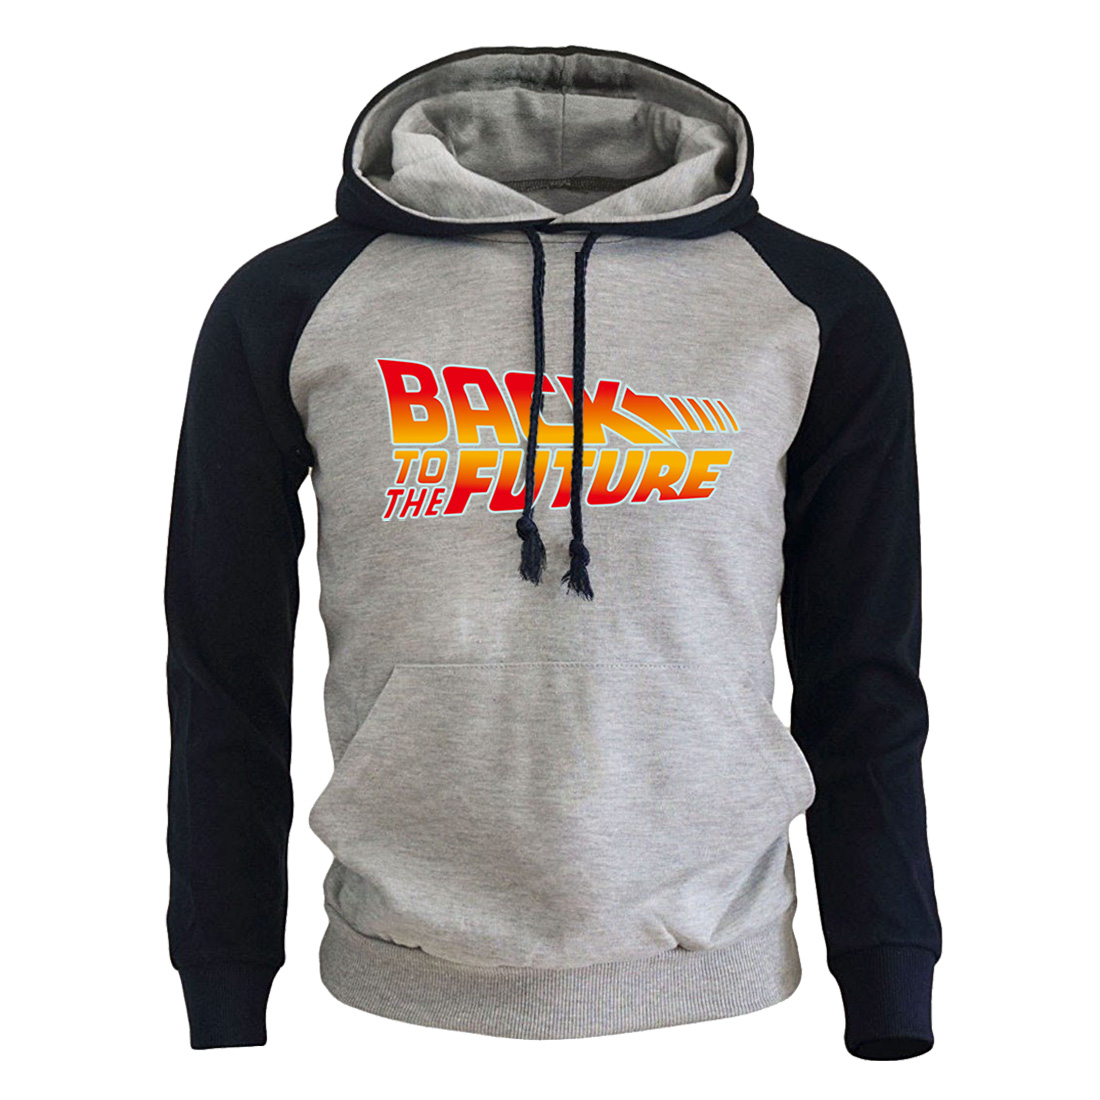 2019 New Arrival Fleece Homme Hoodies Back To The Future Letter Printed Men's Hooded Sweatshirts Hip Hop Streetwear Mens Hoody